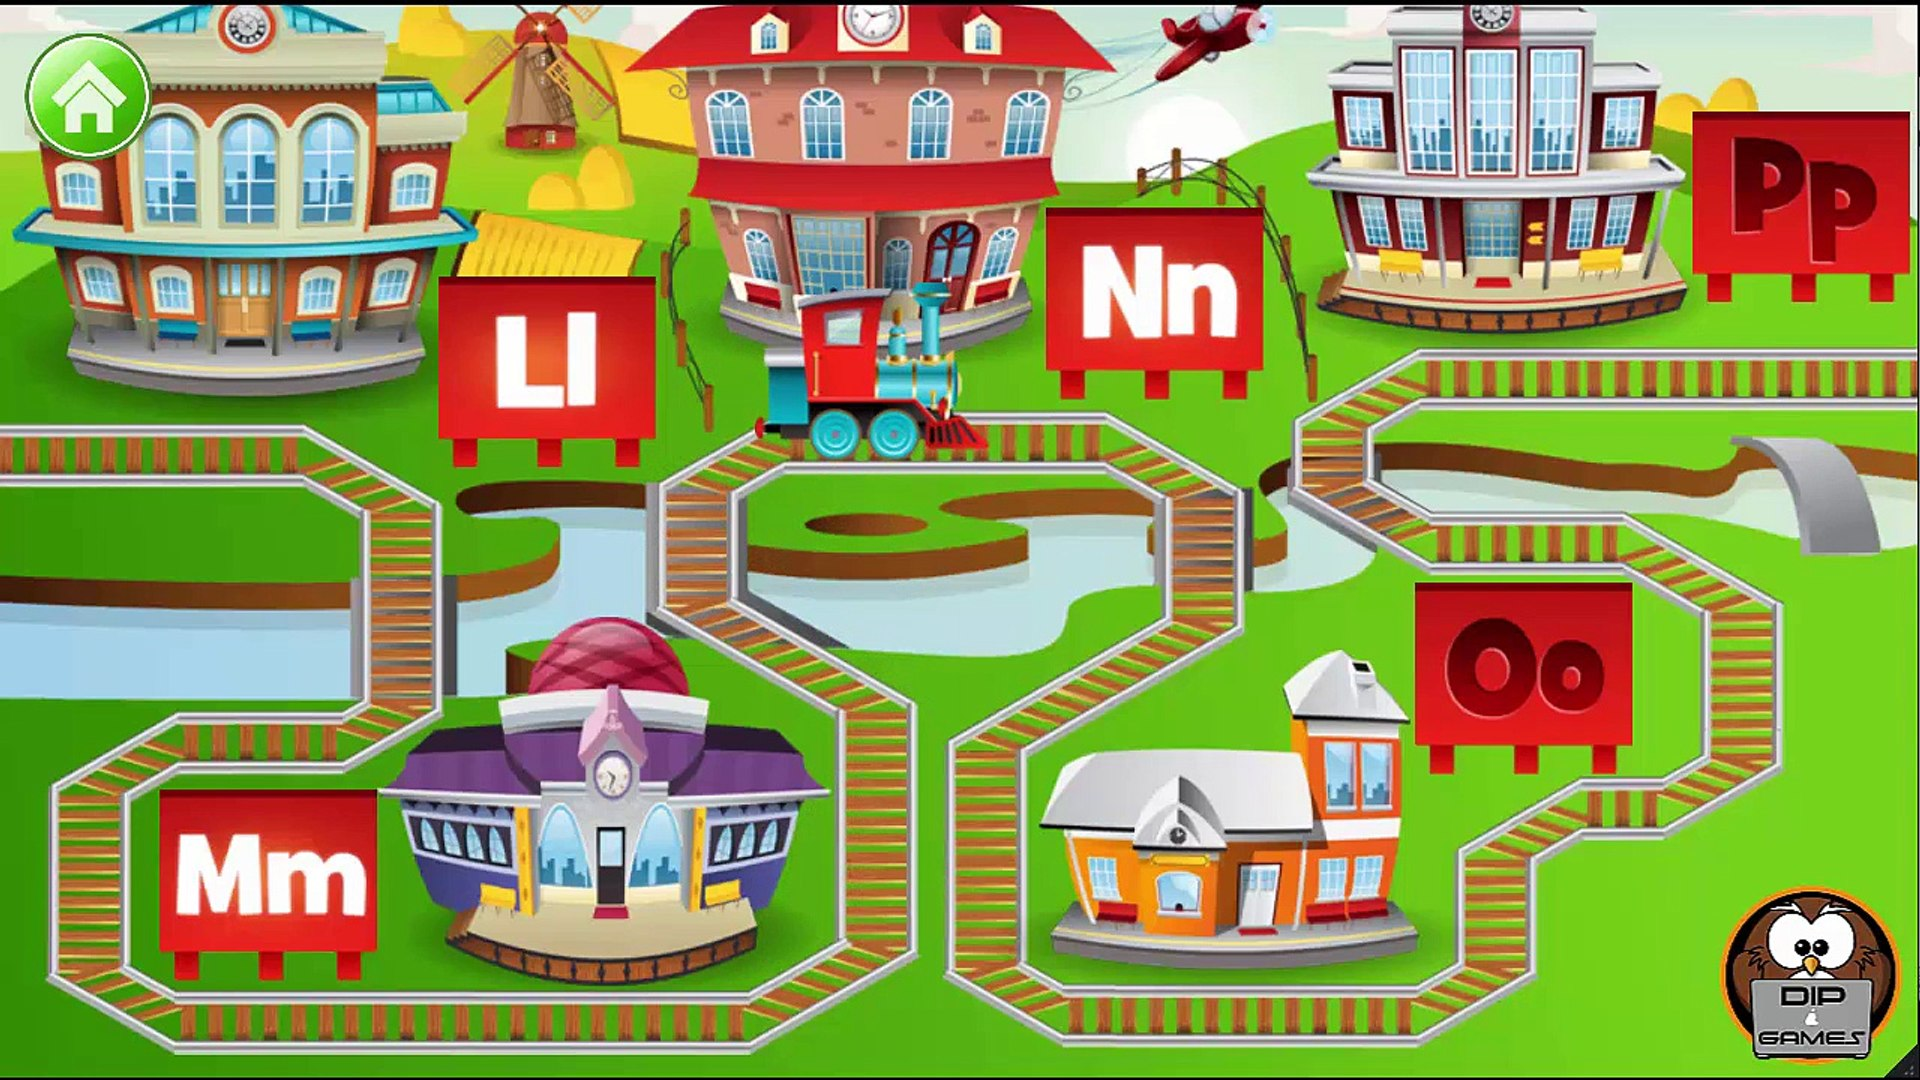 Kids ABC Letter Trains Educational Education Preschool Learning kids ages 2-7 #1